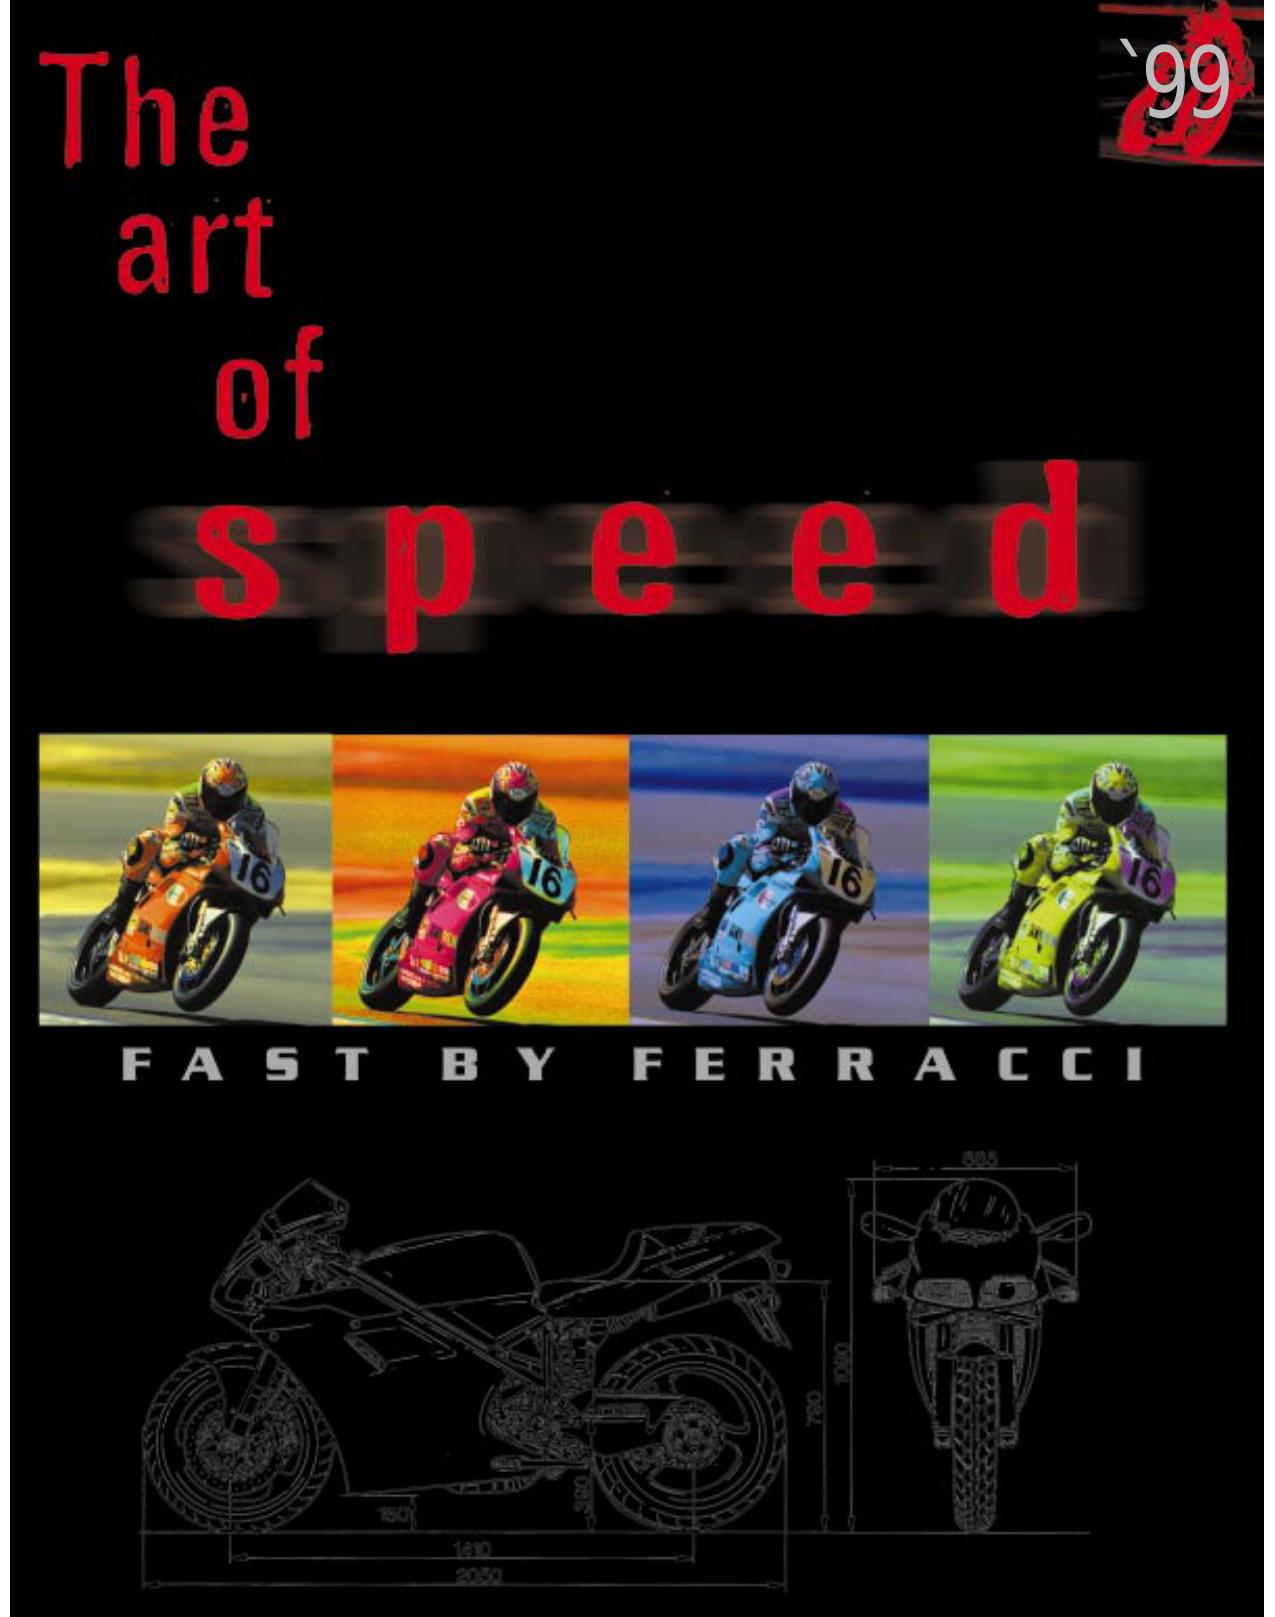 Kit stickers motorcycle ducati performance 15pz choose colour